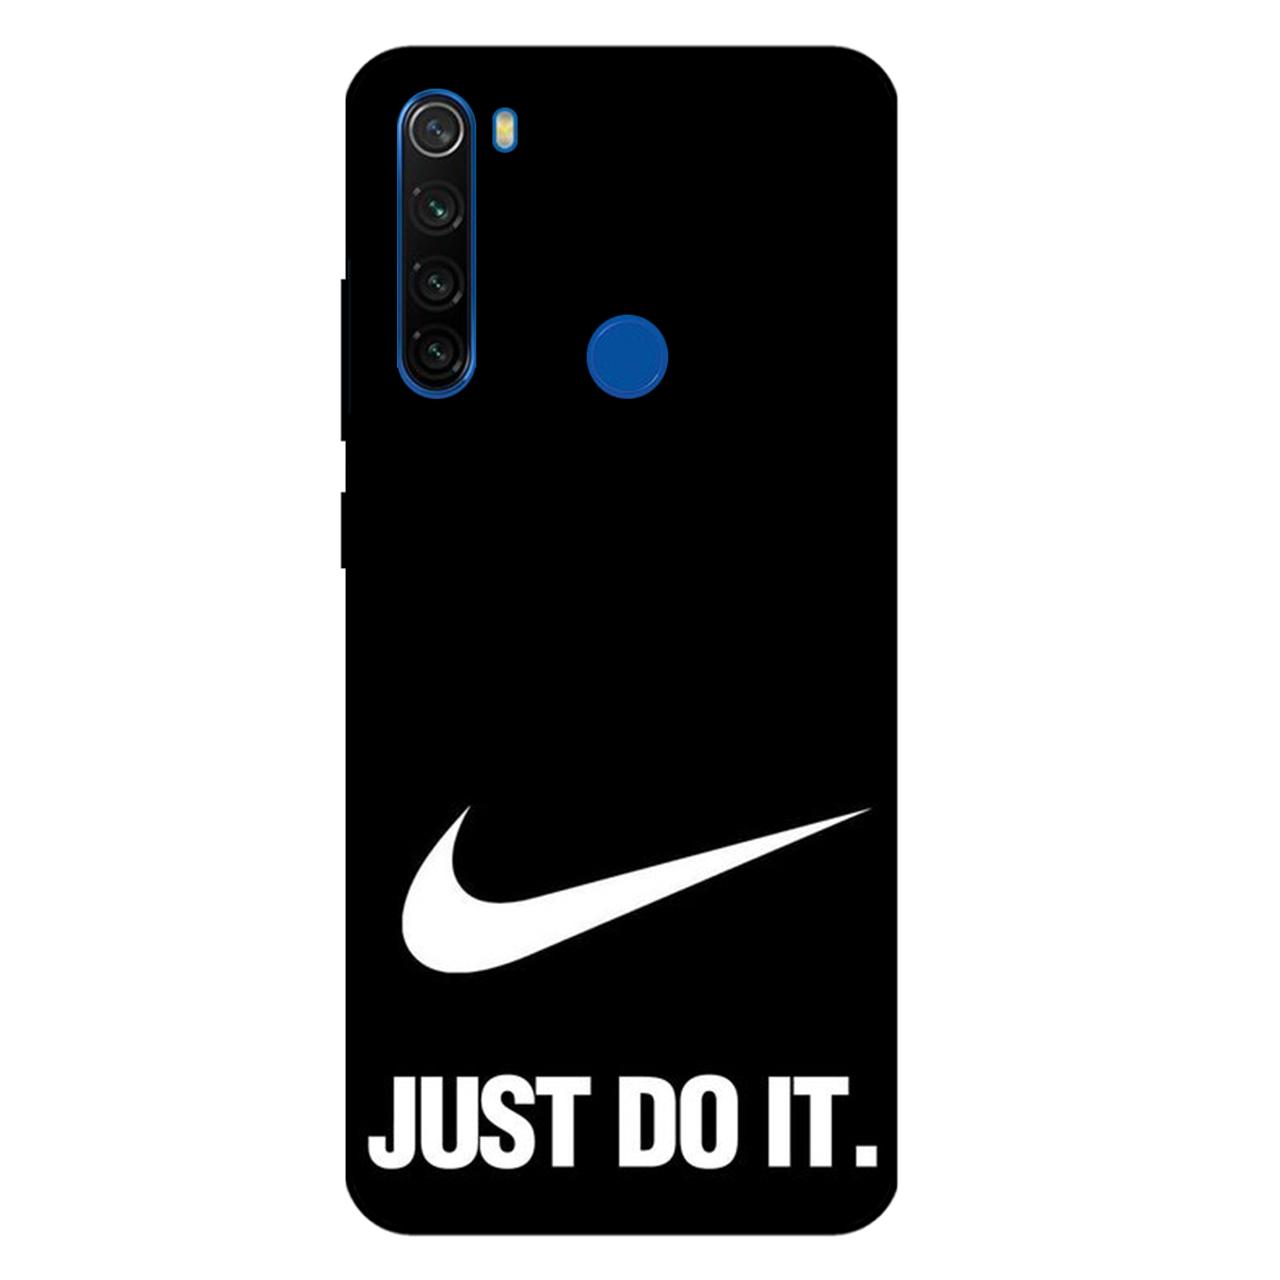 کاور کی اچ کد 3834 مناسب برای گوشی موبایل شیائومی Redmi Note 8T 2019 thumb 2 1